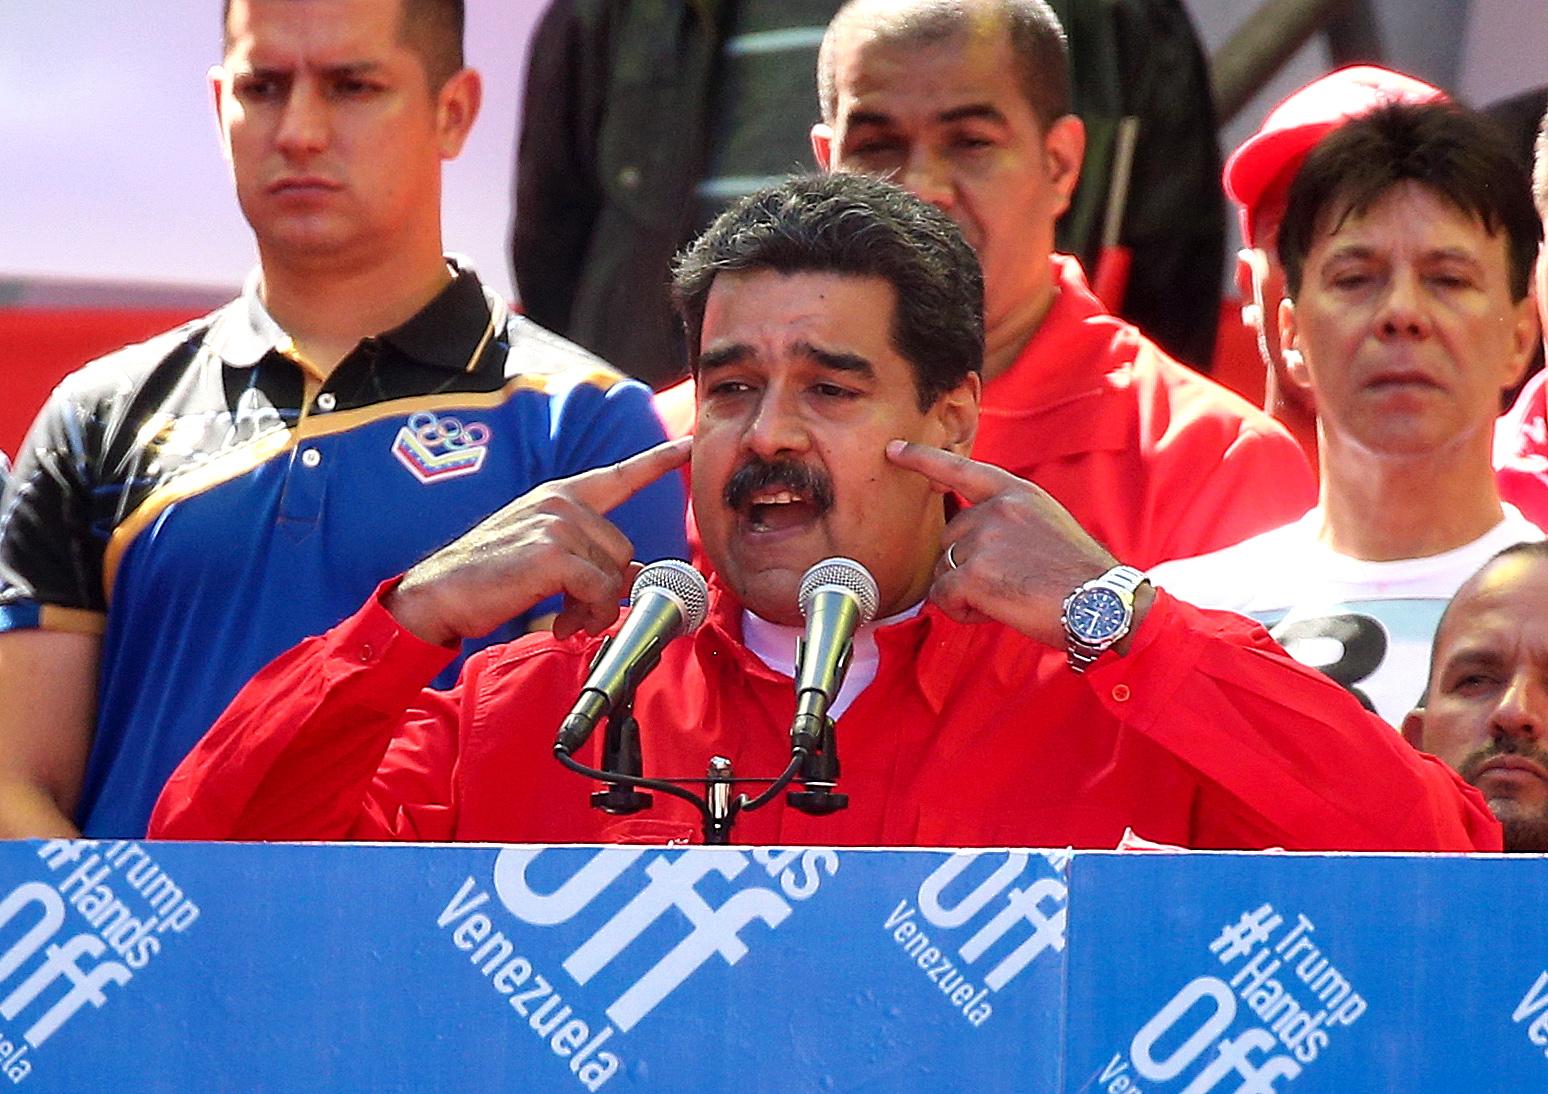 Rallies support President Maduro in Caracas, Venezuela